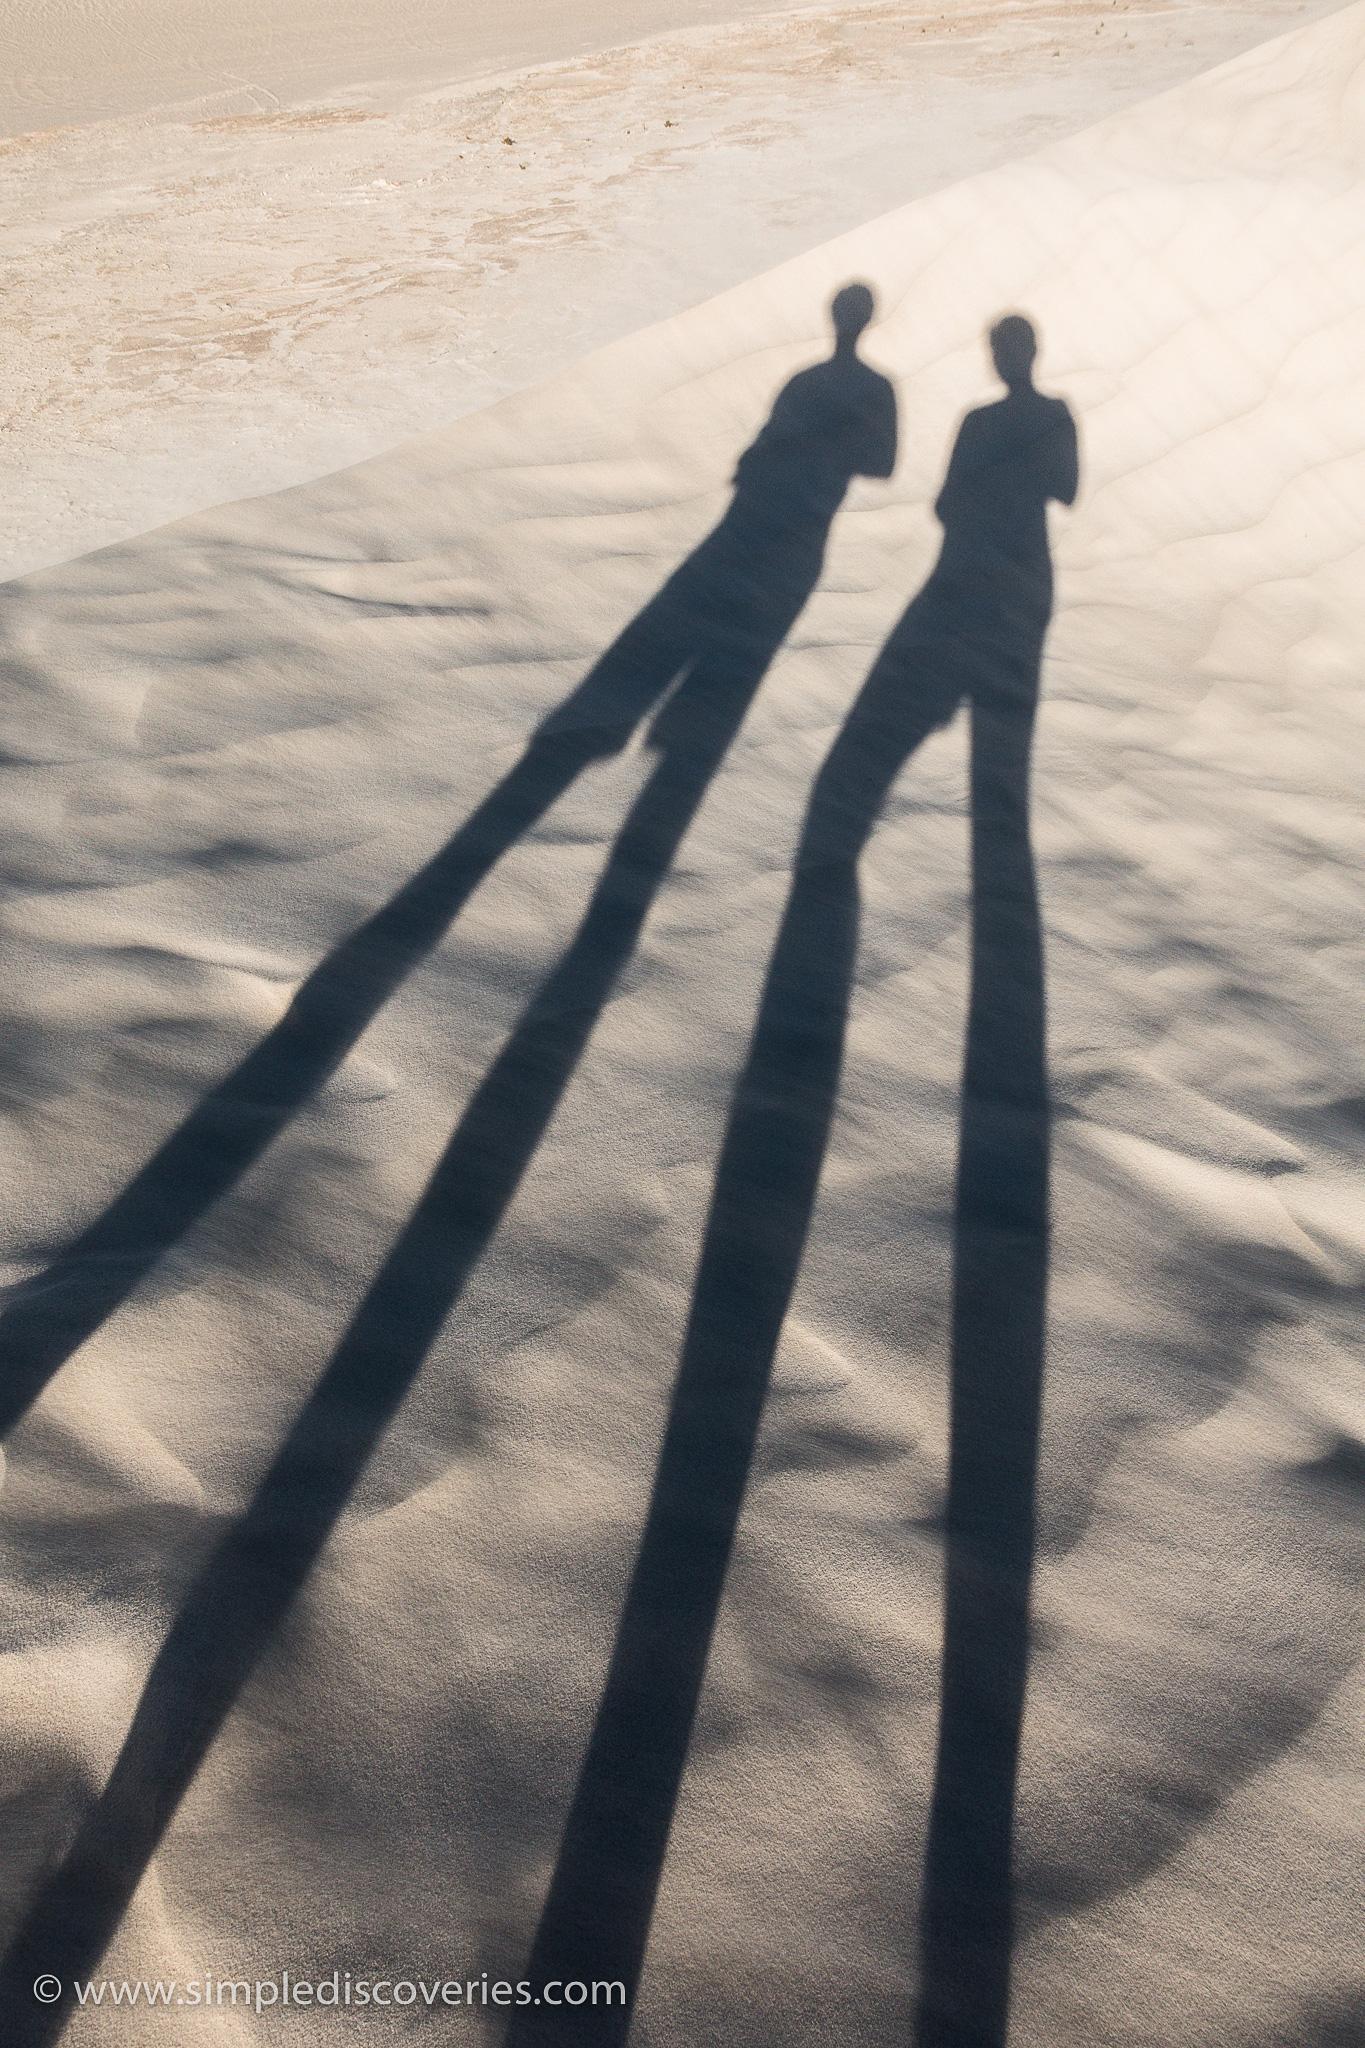 lancelin_dunes_shadows_australia